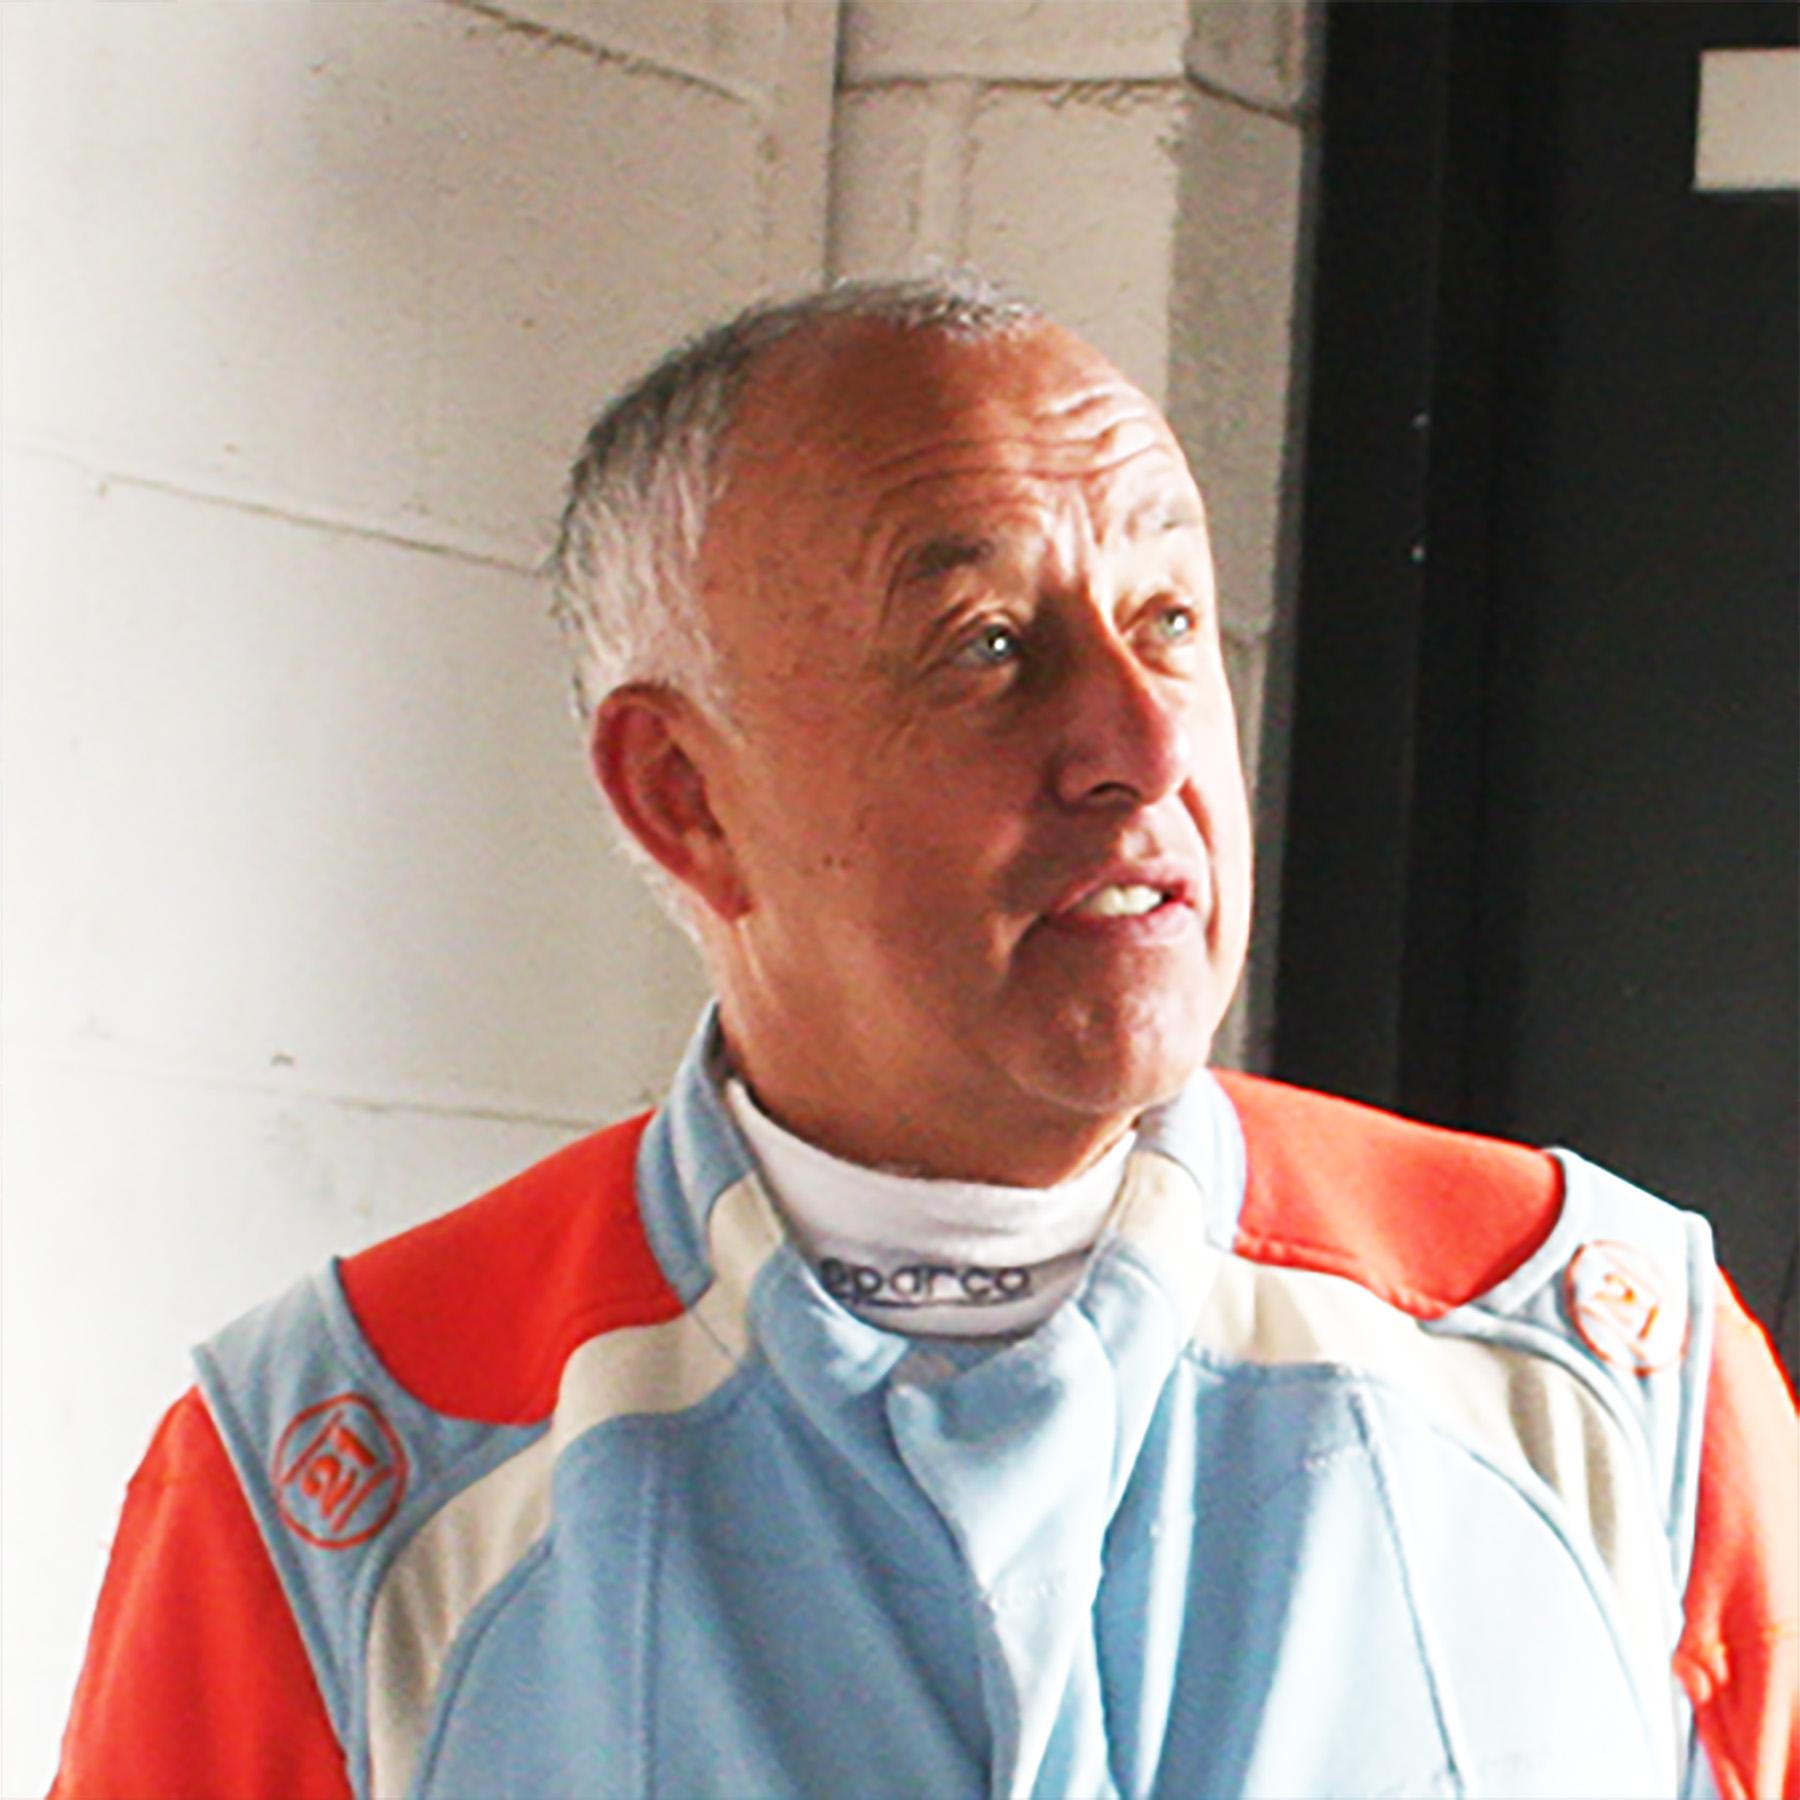 Geoff Tremblett MCR Racing Car driver